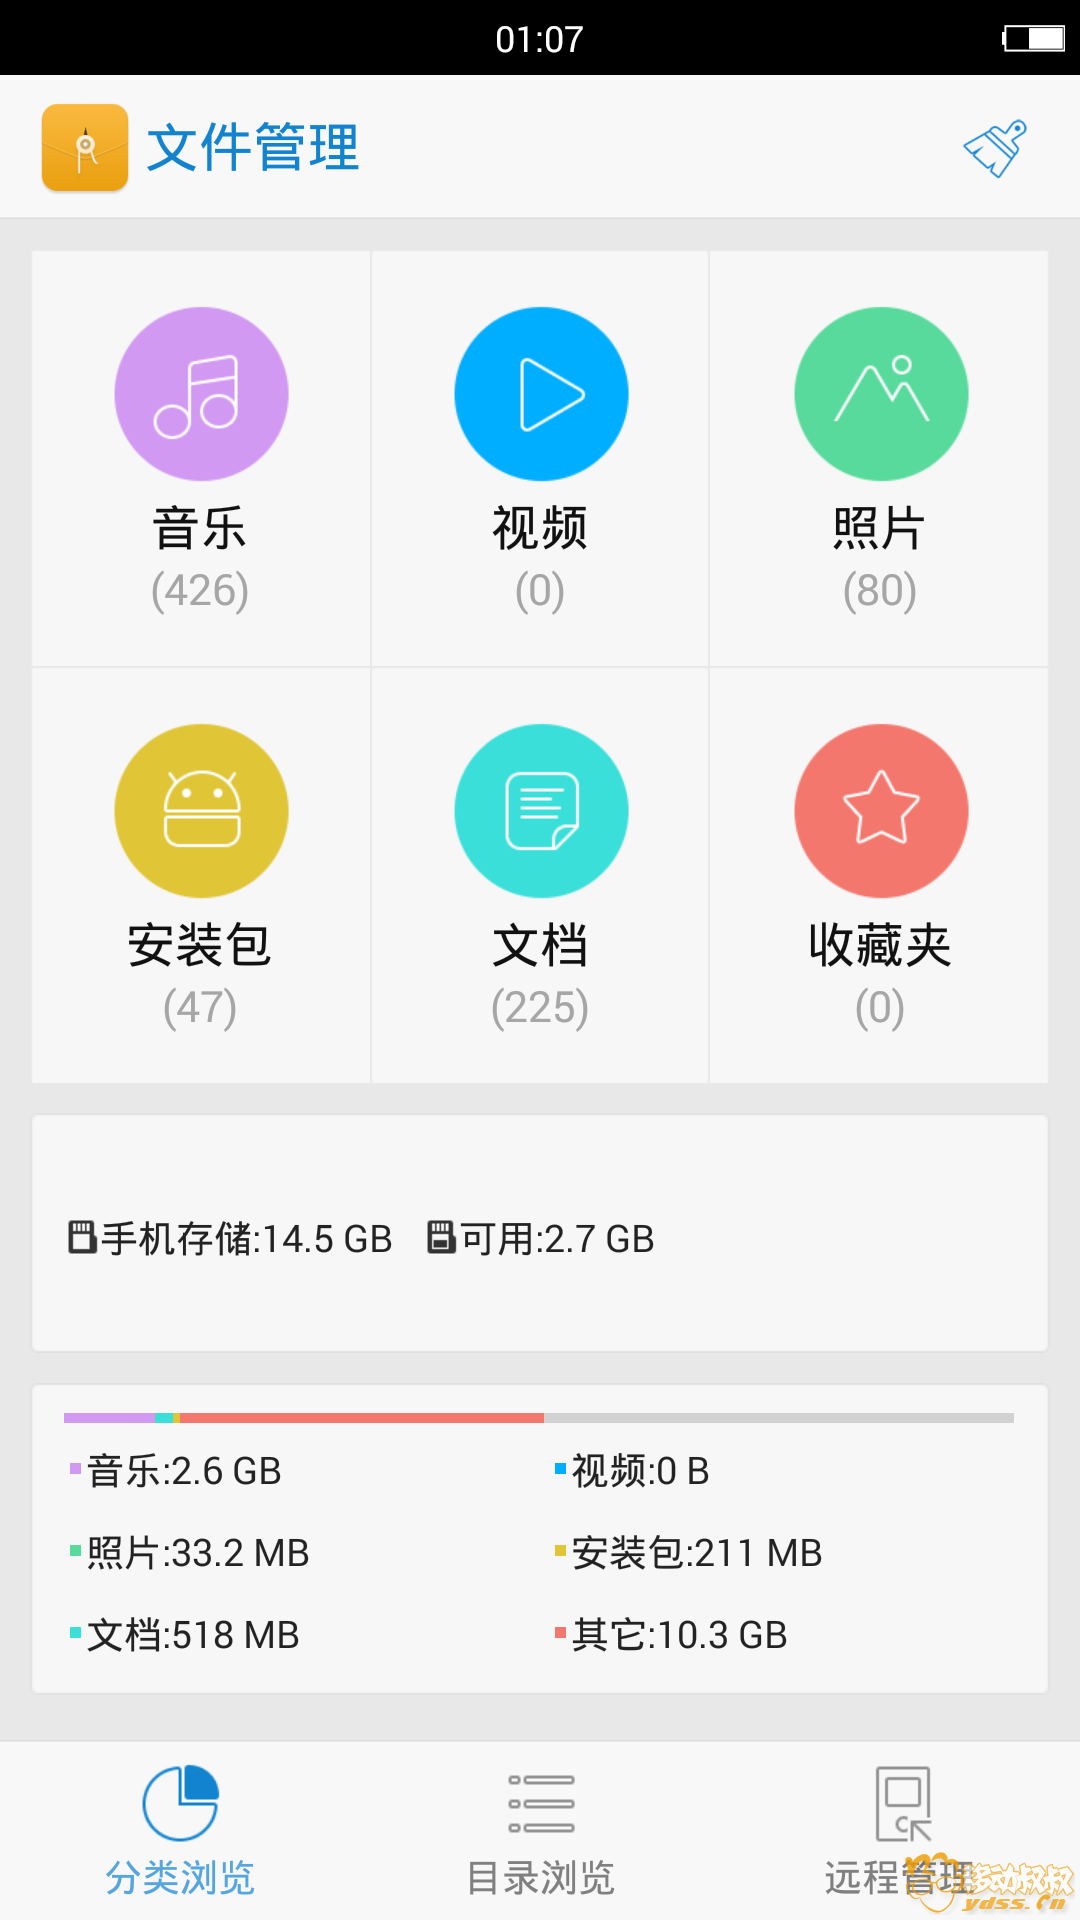 Screenshot_2014-01-01-01-07-15.png